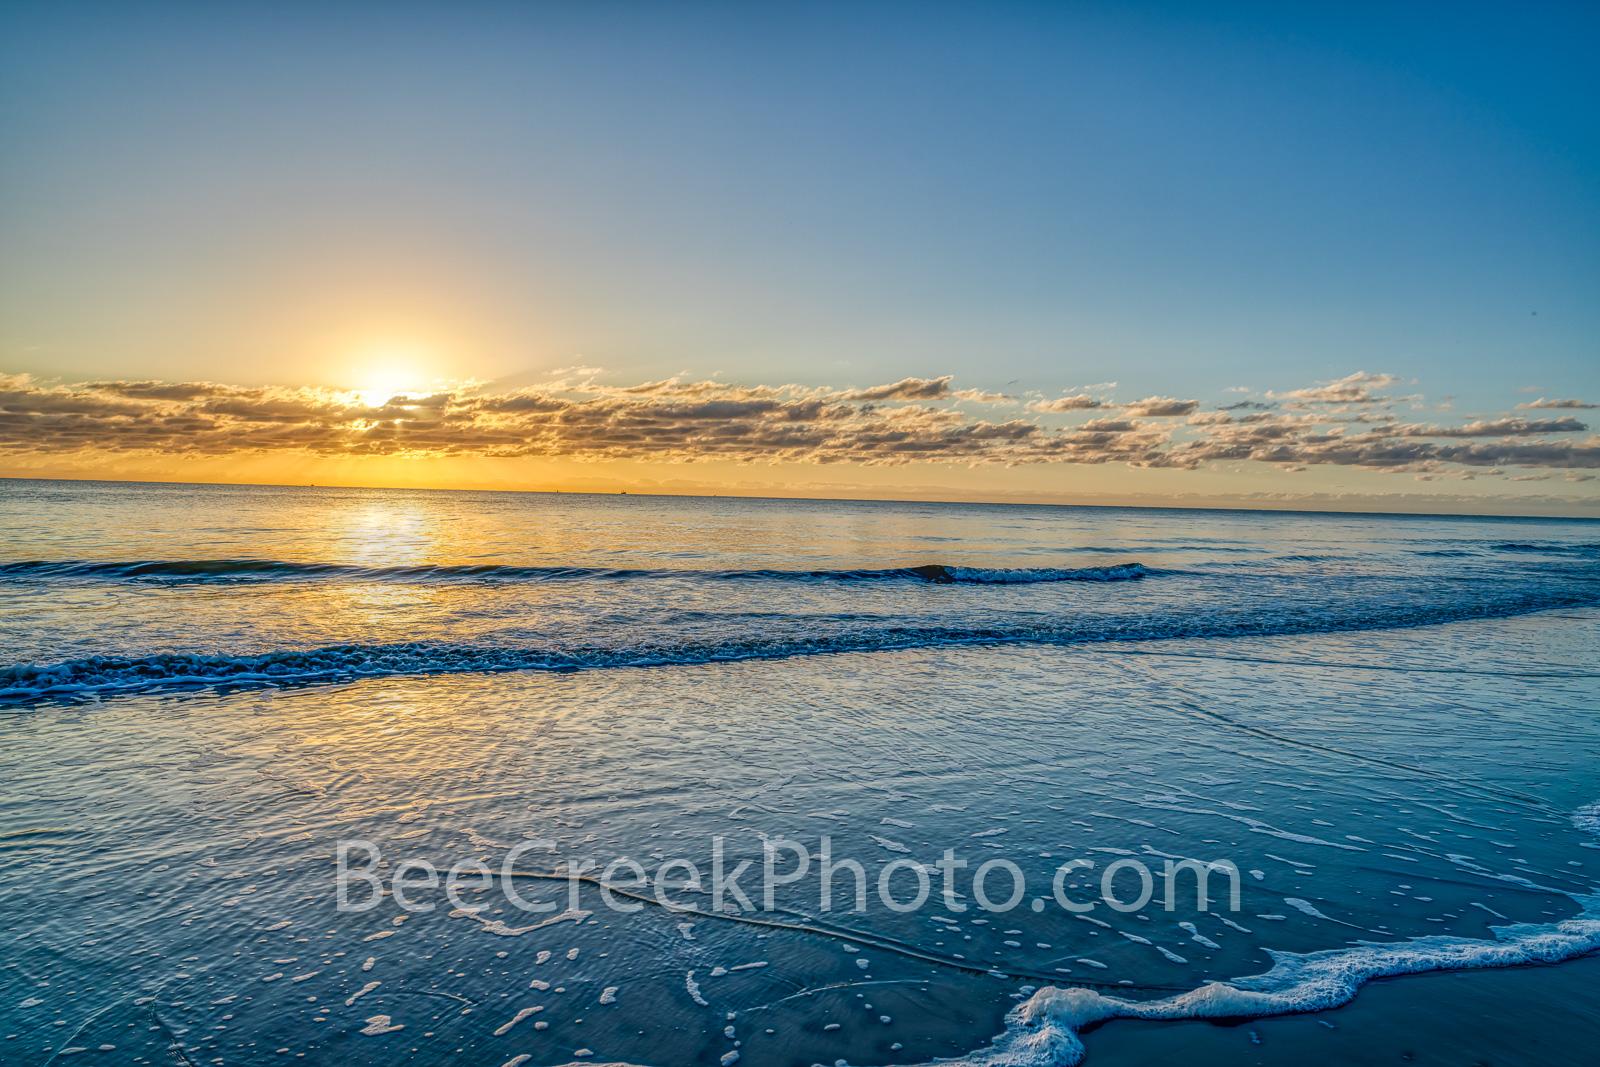 beach, seascape, sea and sand, golden glow, sandy beach, morning, ocean, waterscape, surf, tide, ocean scene,  beach scenery, beach, georgia, alantic ocean, southern usa, beach sunrise, , photo